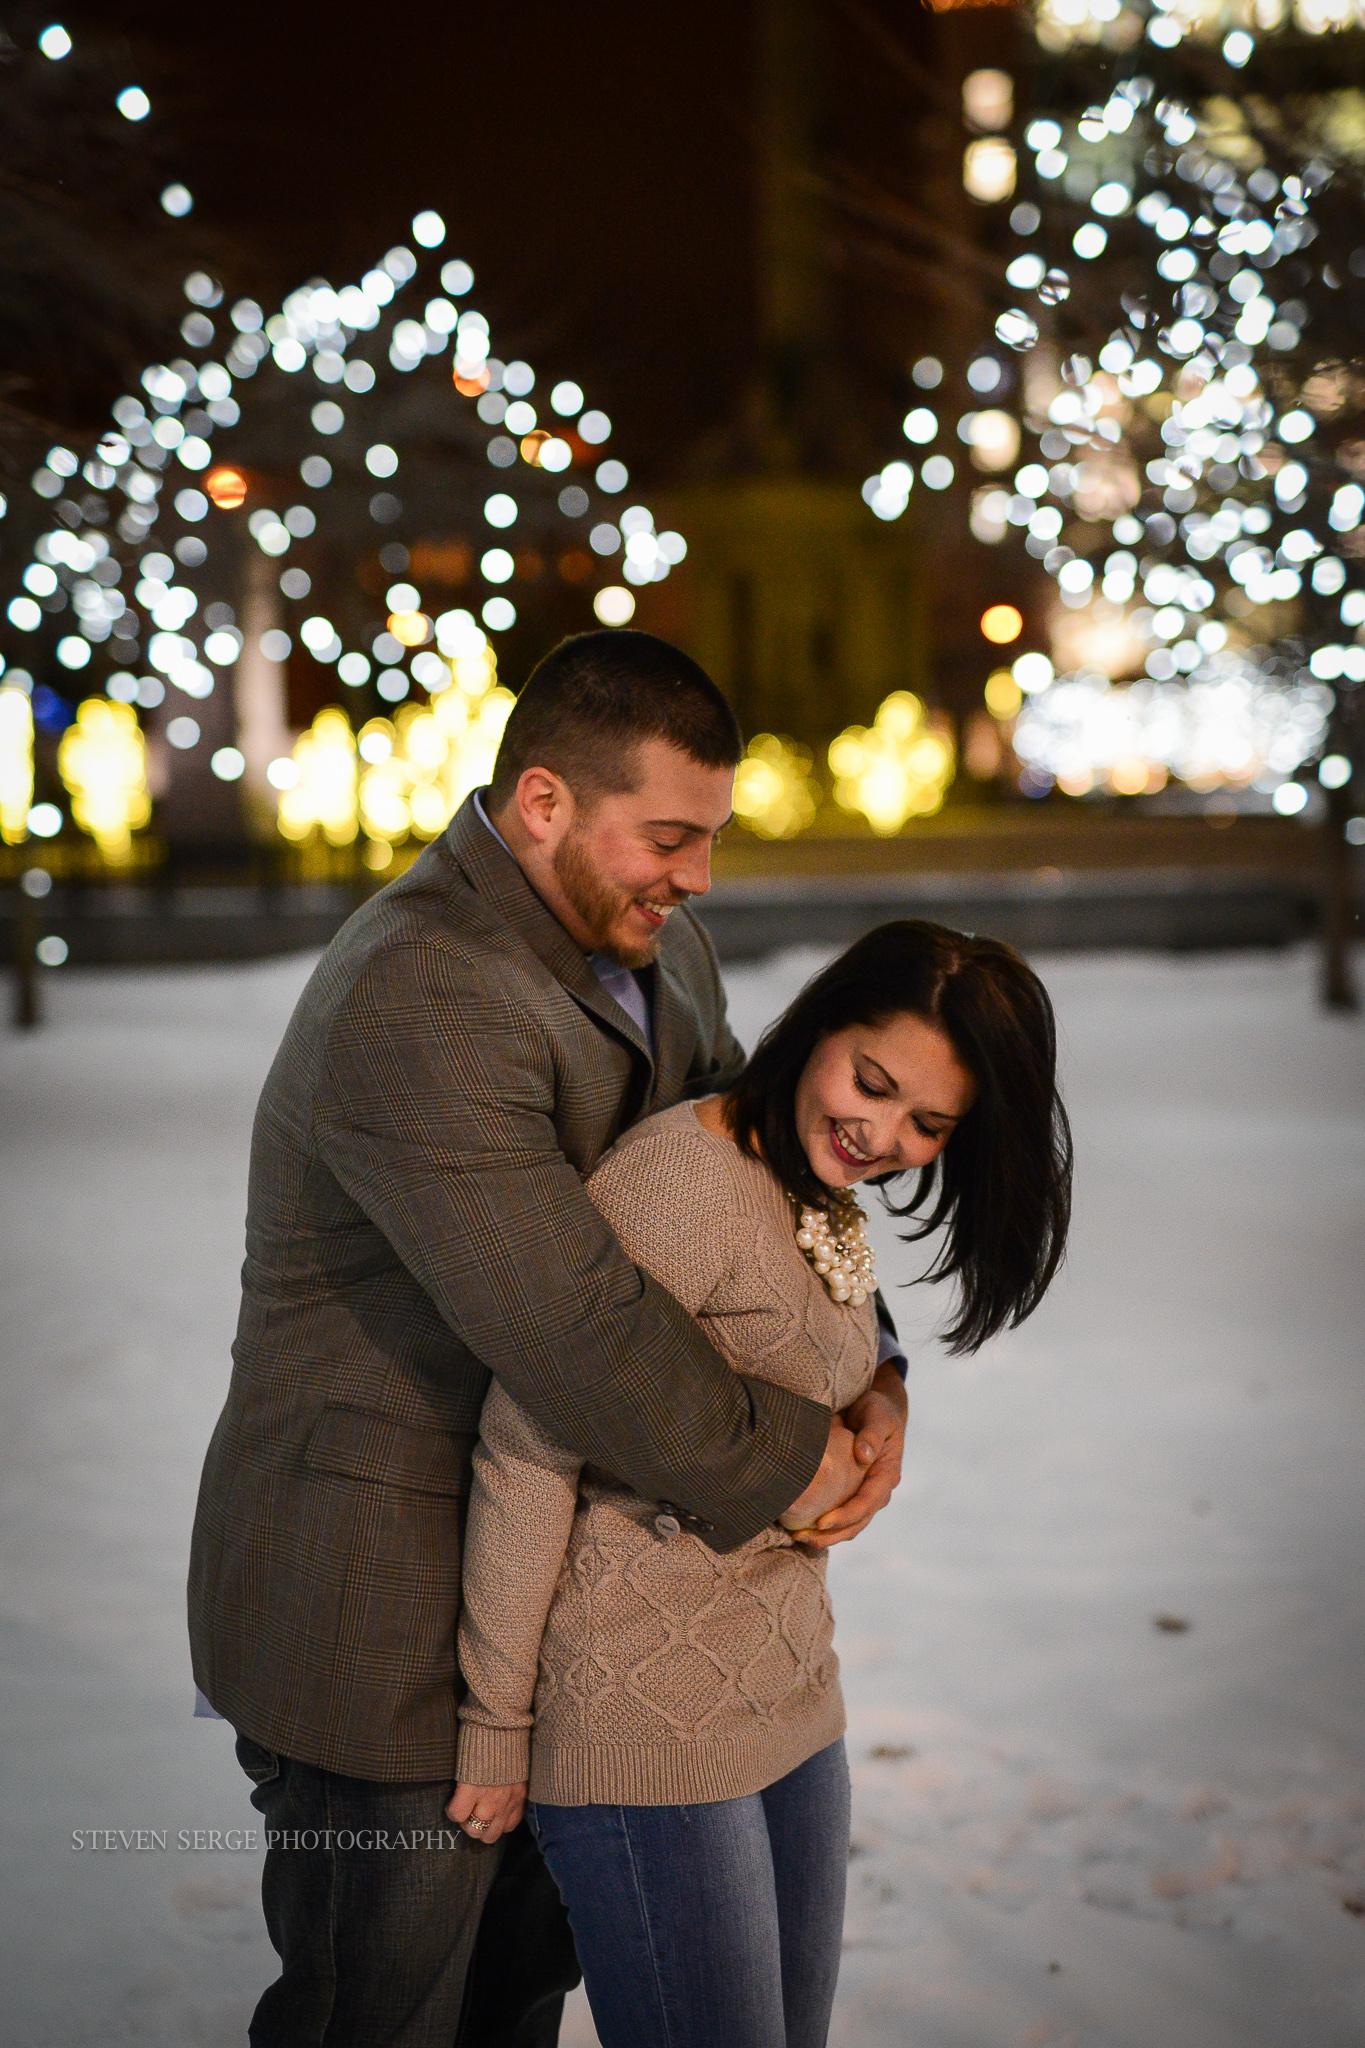 Lindsey-Cultural-Center-Scranton-Engagement-Wedding-Nepa-Photographer-Steamtown-Photography-3.jpg